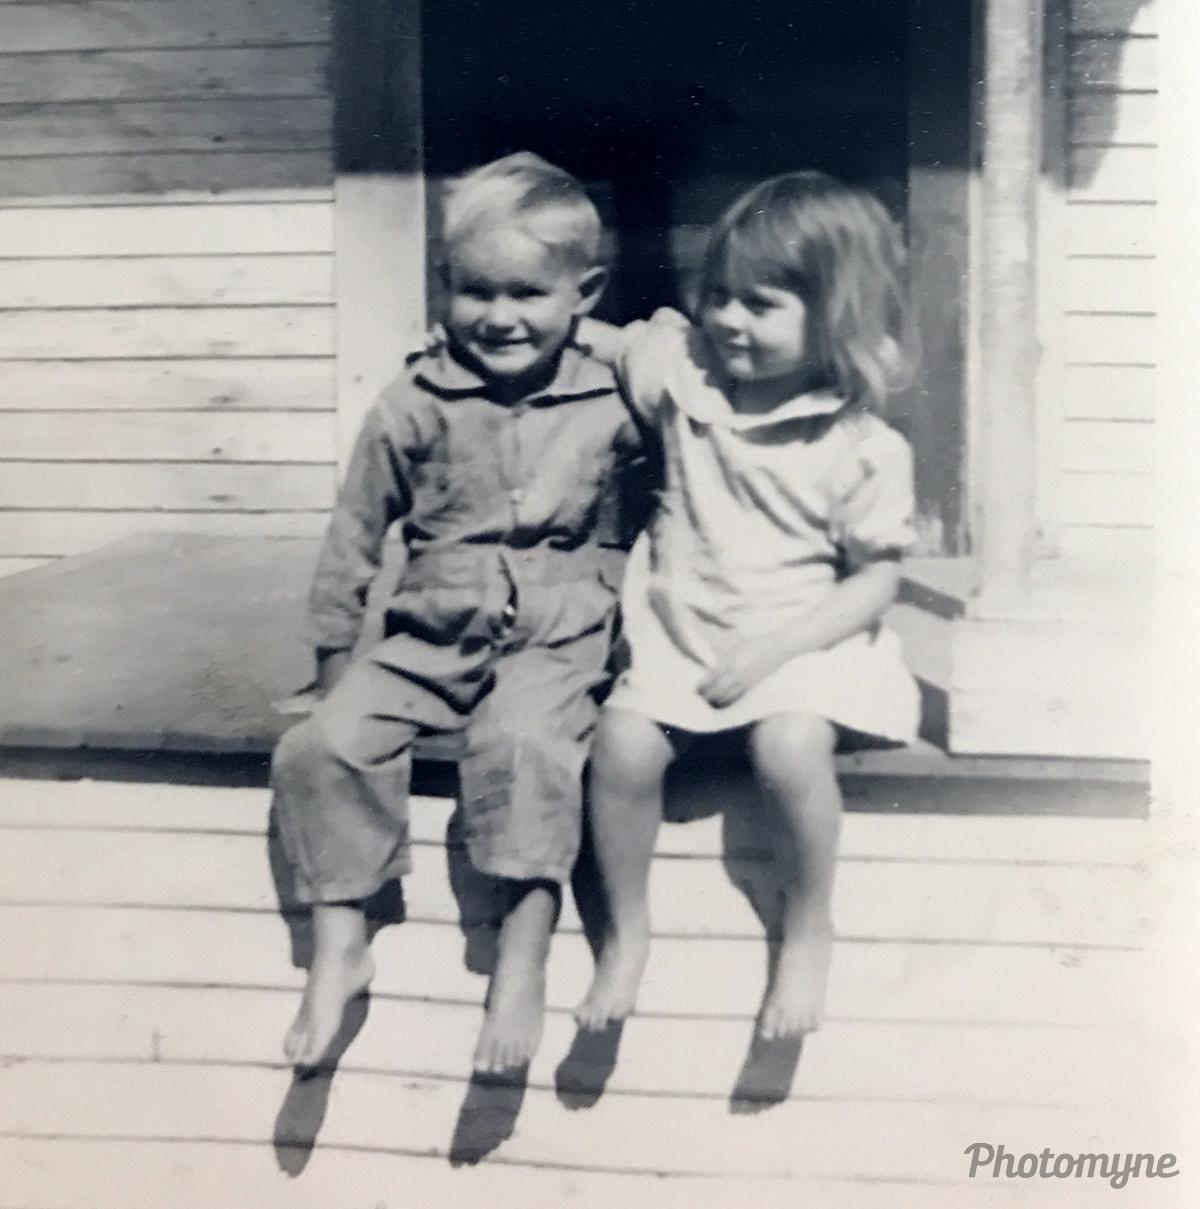 Dewayne Price & Wilma Stenhouse. California, USA 1941